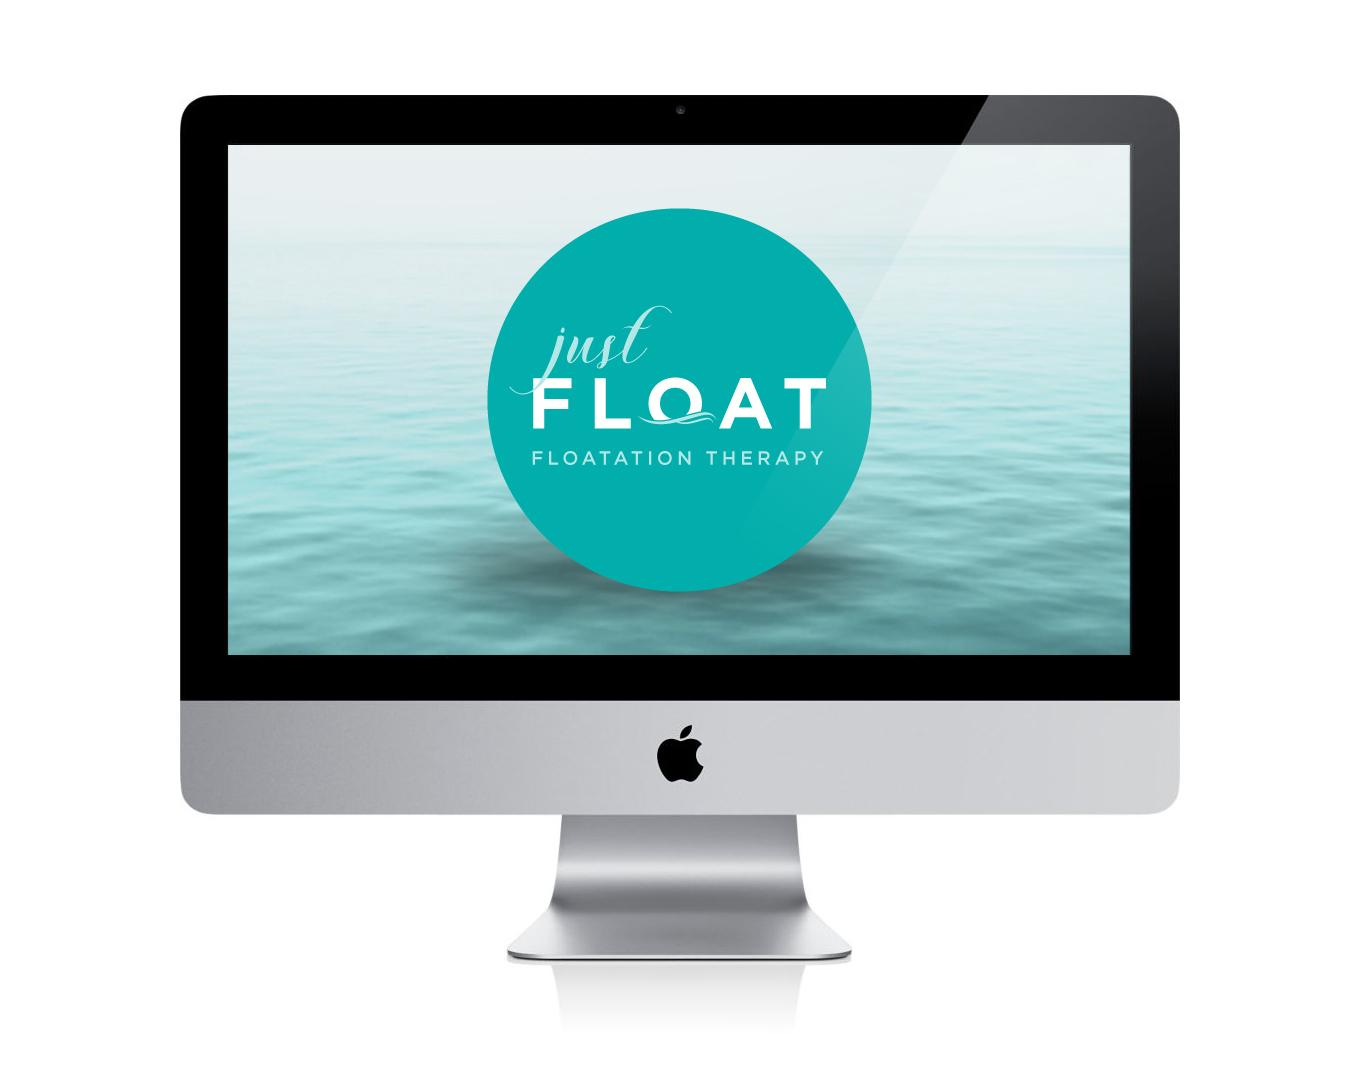 Just float floatation therapWeb imac